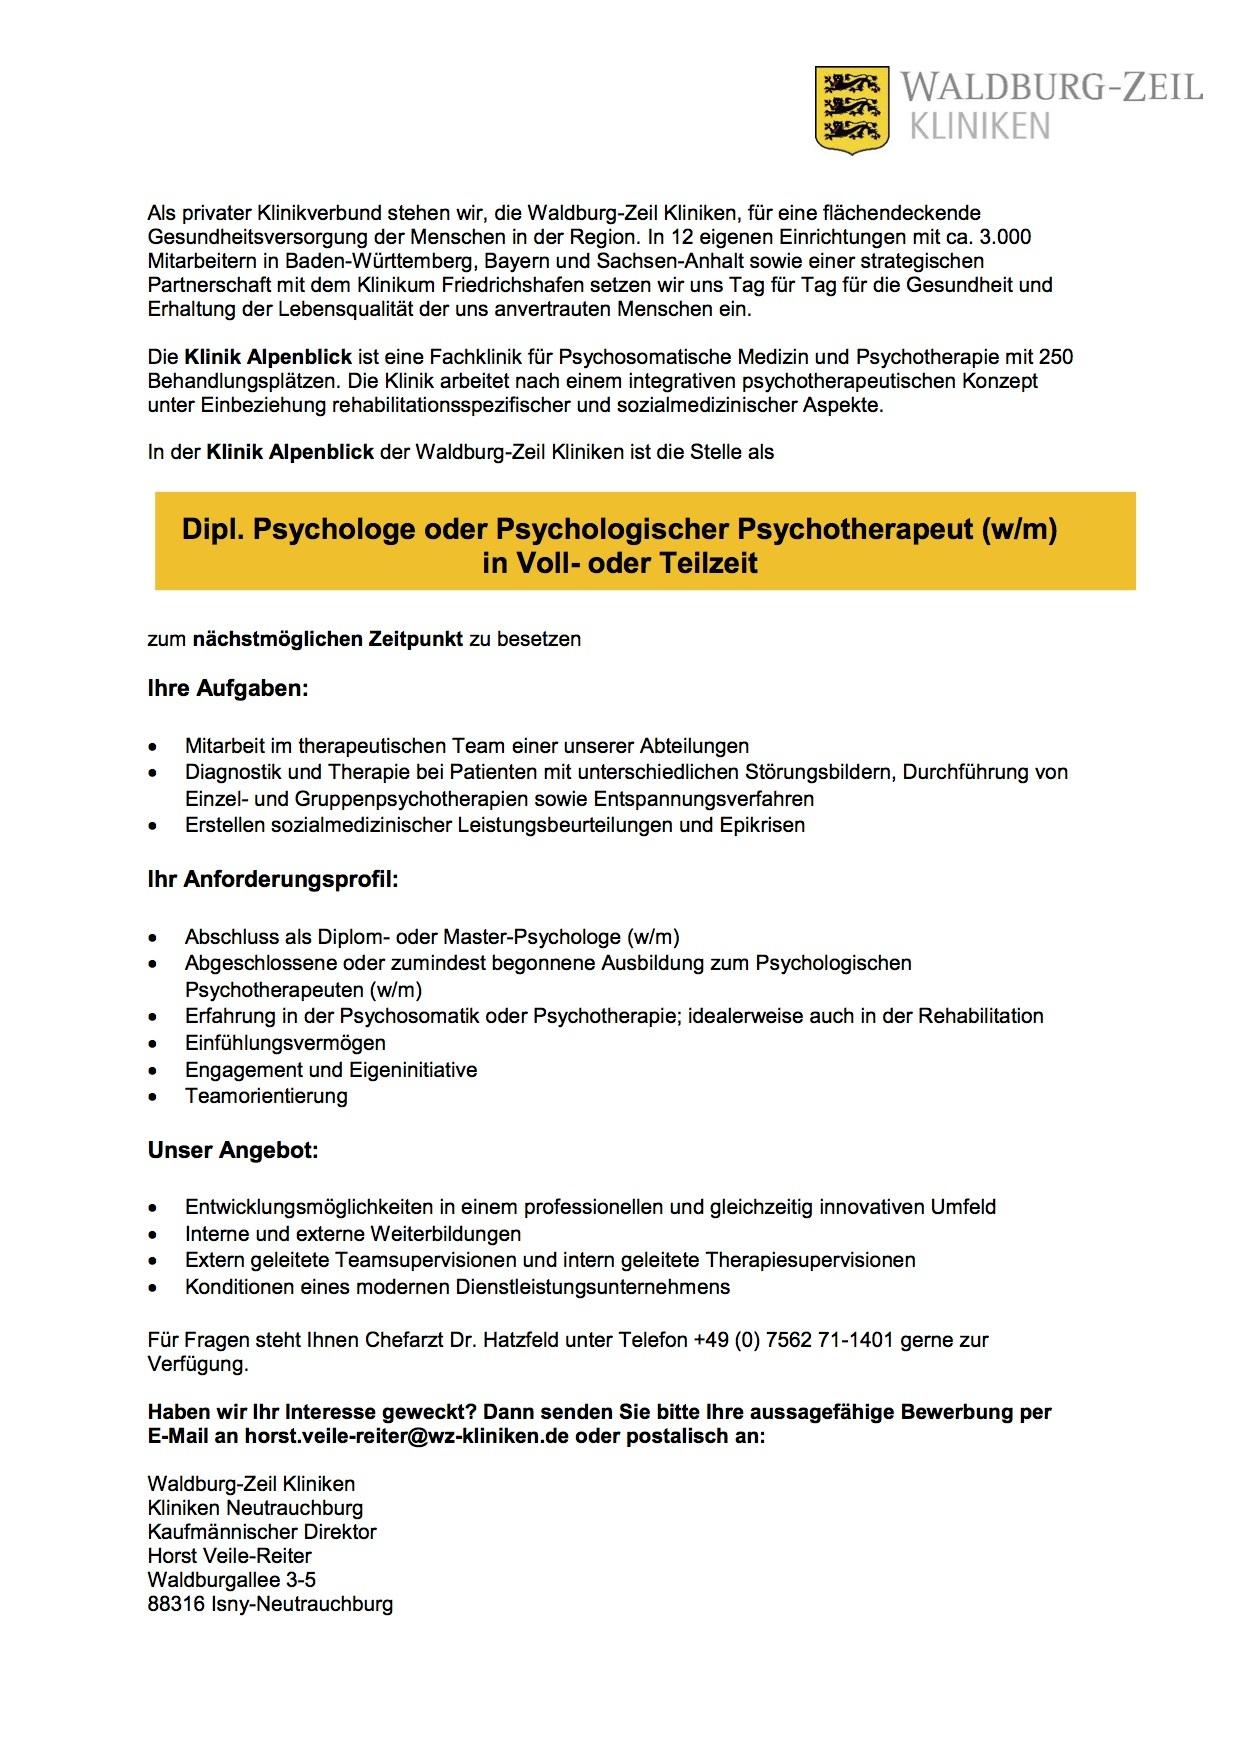 Dipl. Psychologe oder Psychologischer Psychotherapeut (w/m)